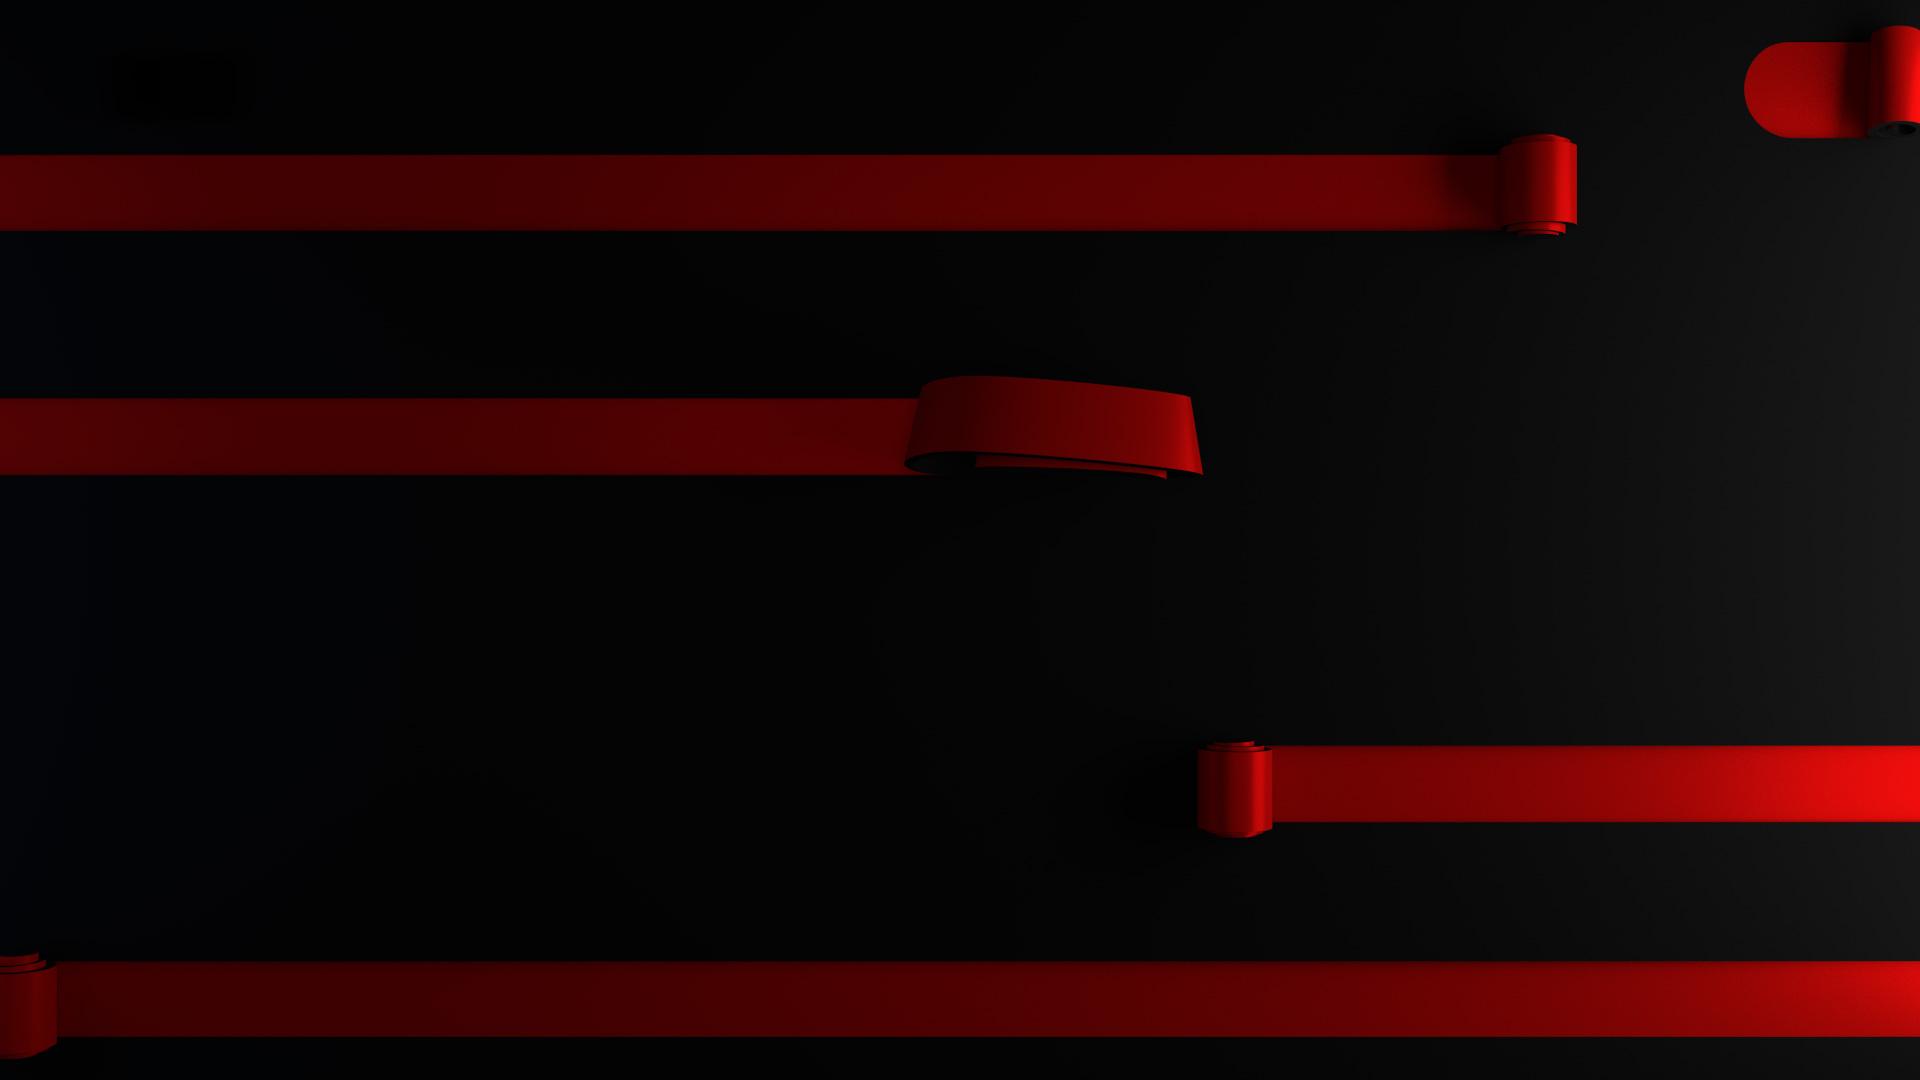 Black Crown Wallpaper X1bg 3d Rolls Red Black 2 Martin Crownover